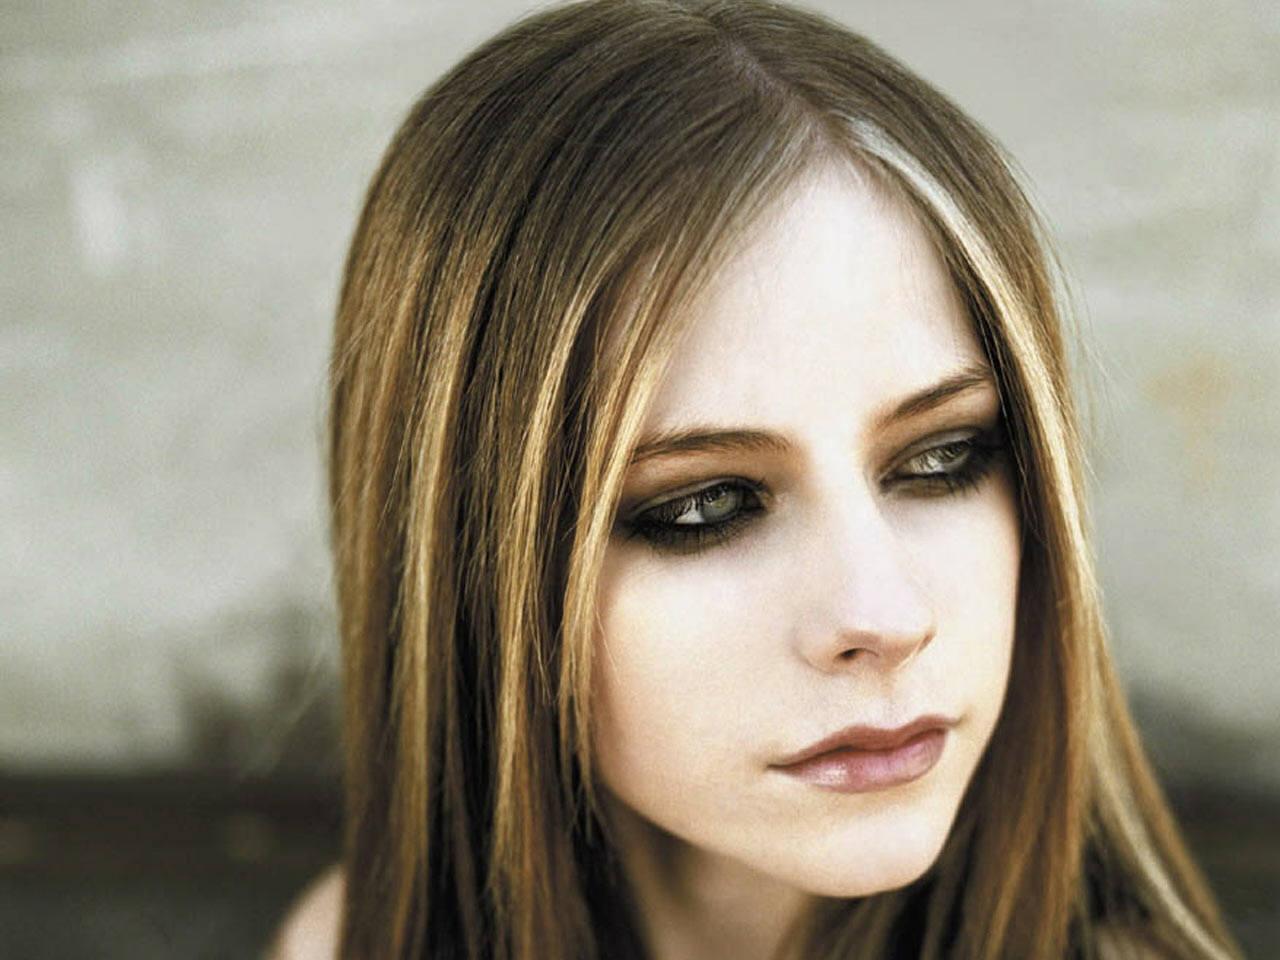 Entertainment: Avril Lavigne